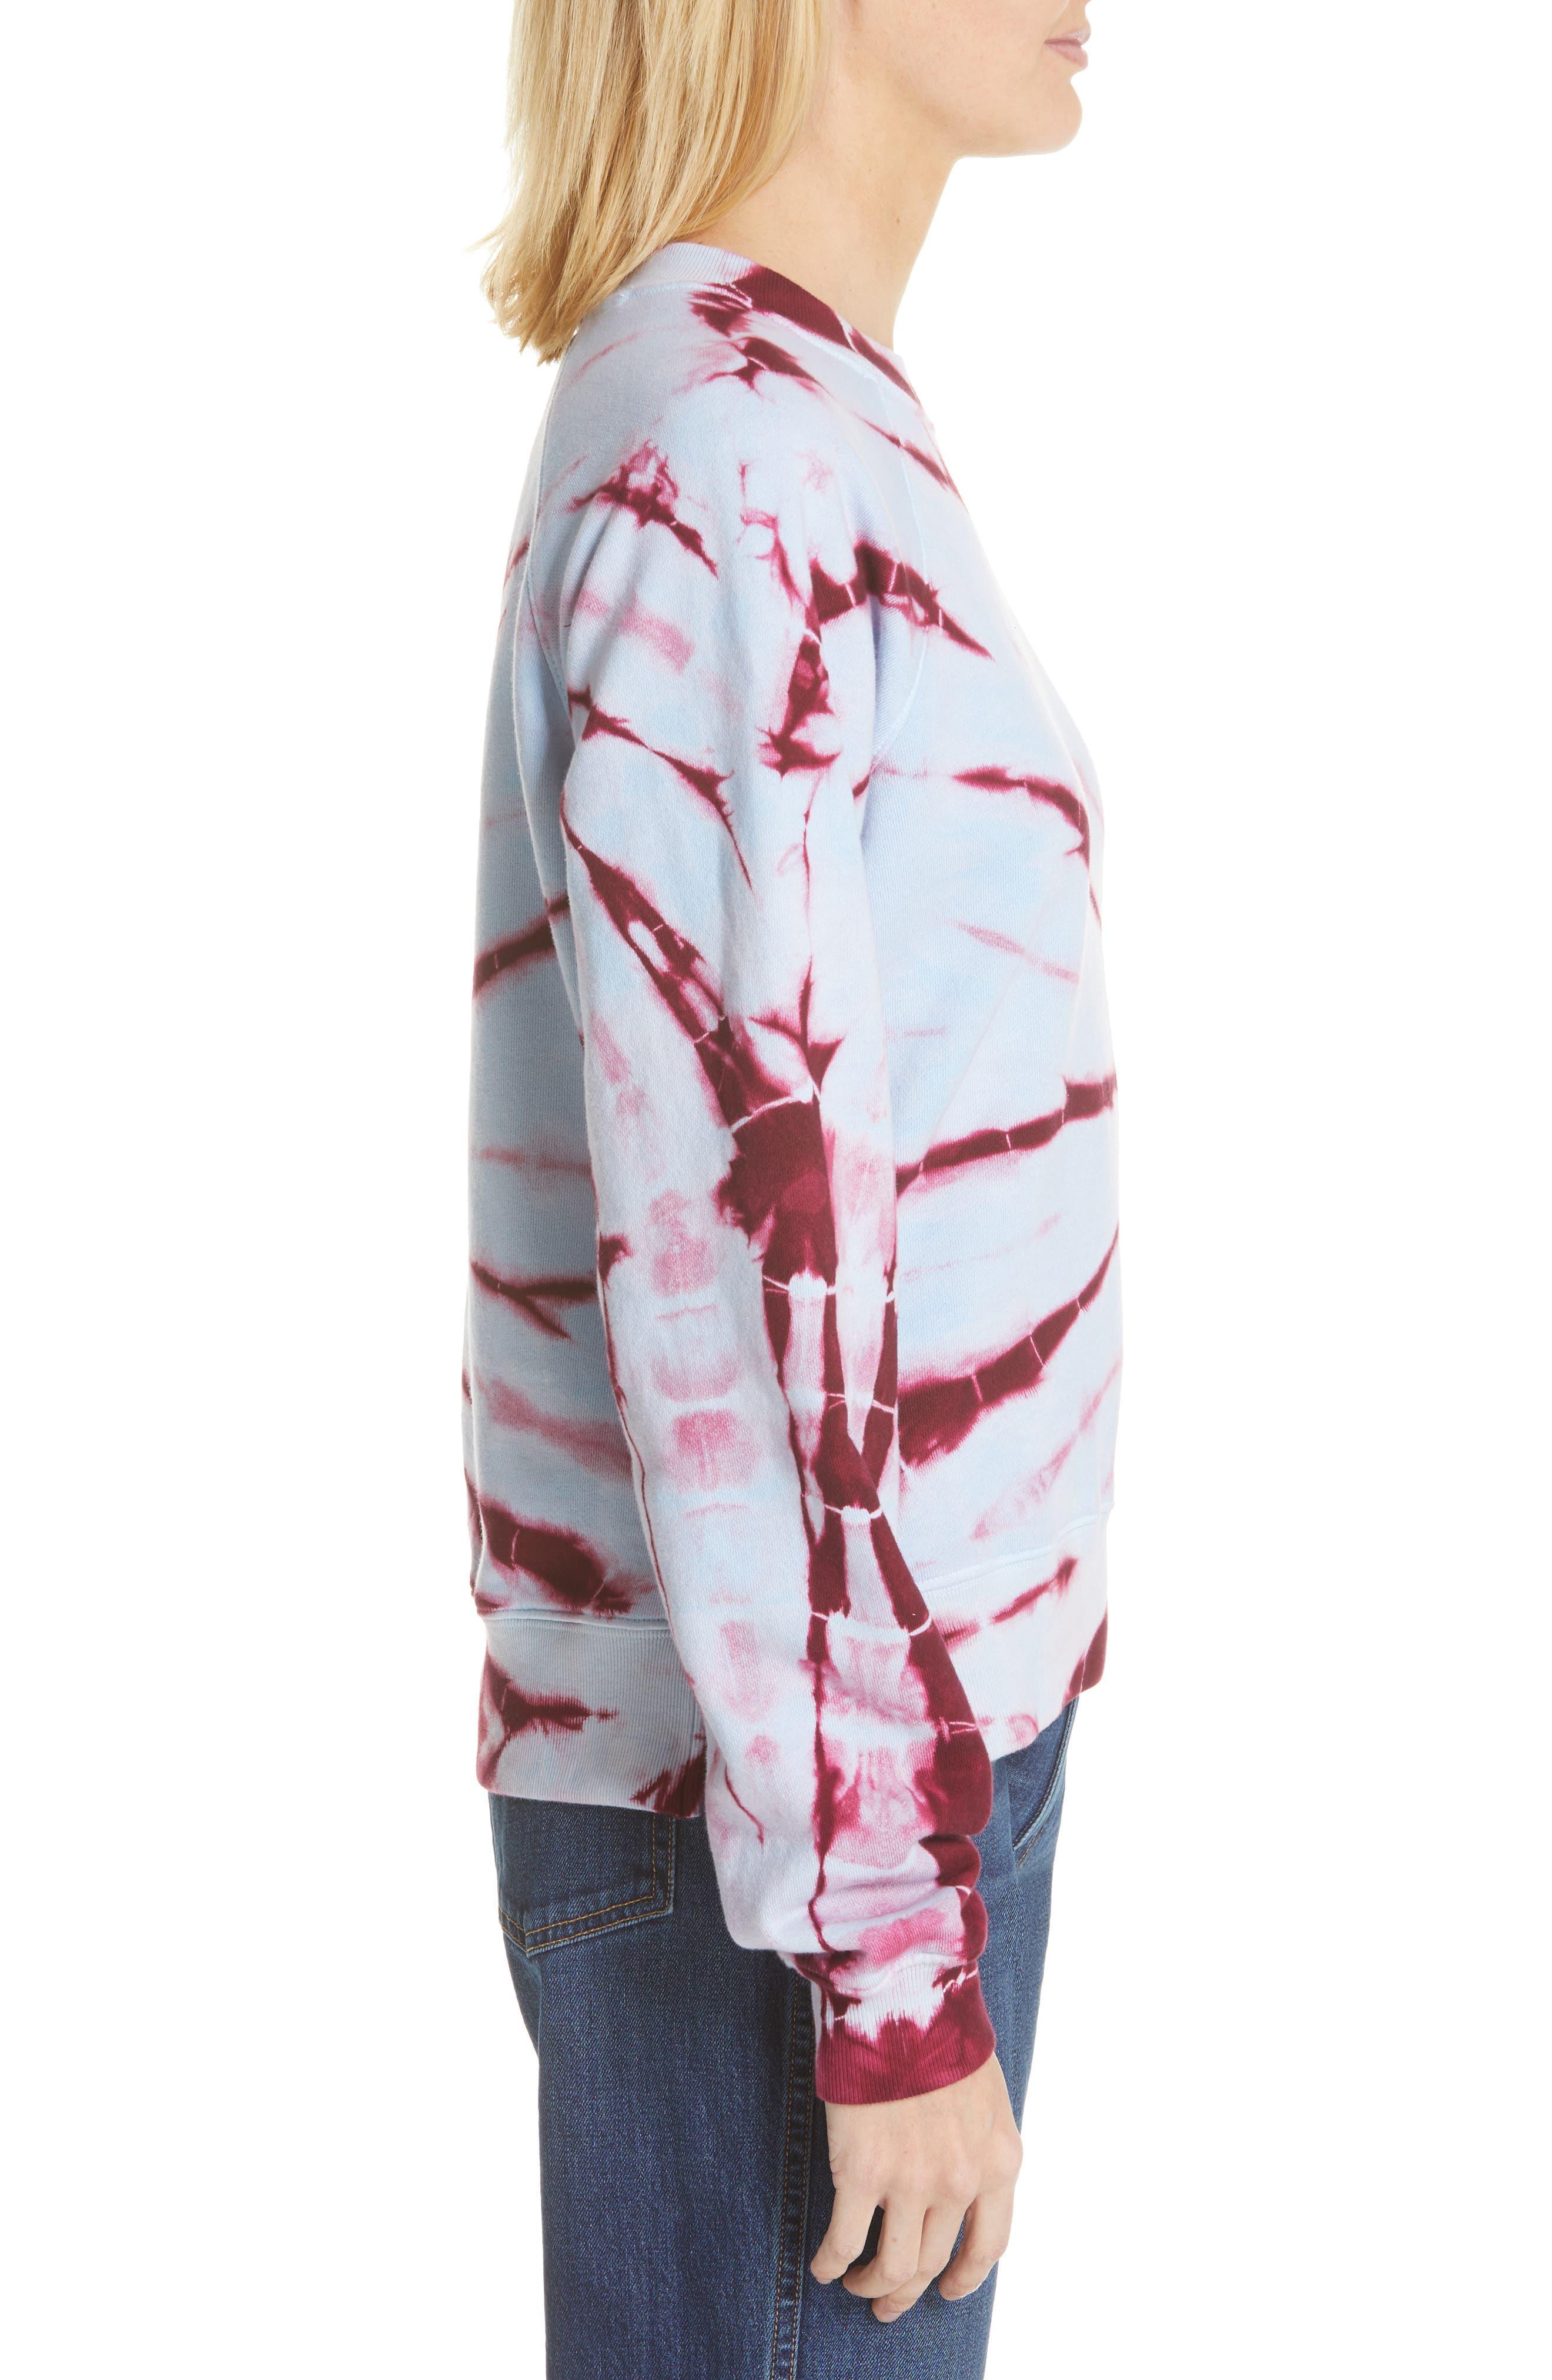 PROENZA SCHOULER, PSWL Tie Dye Sweatshirt, Alternate thumbnail 3, color, BABY BLUE/ RED TIE DYE